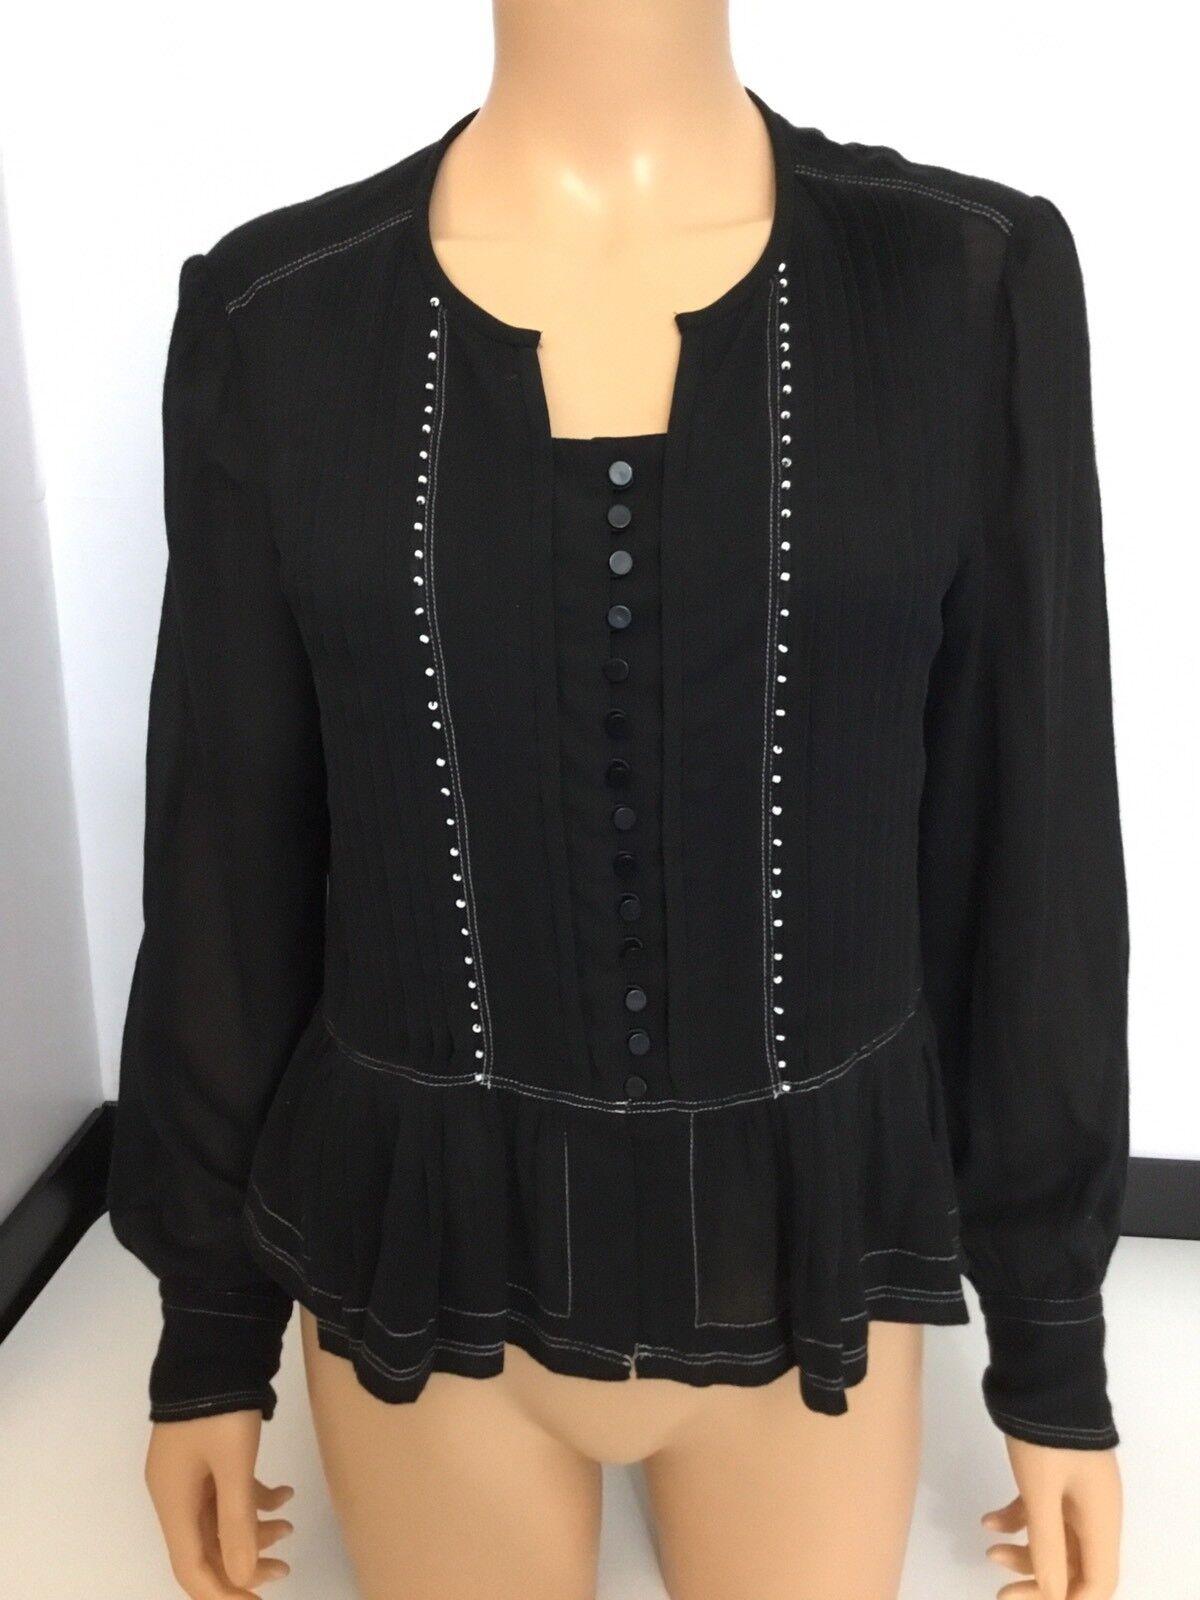 Isabel Marant schwarz Blouse Shirt Top Größe 38 Long Sleeve